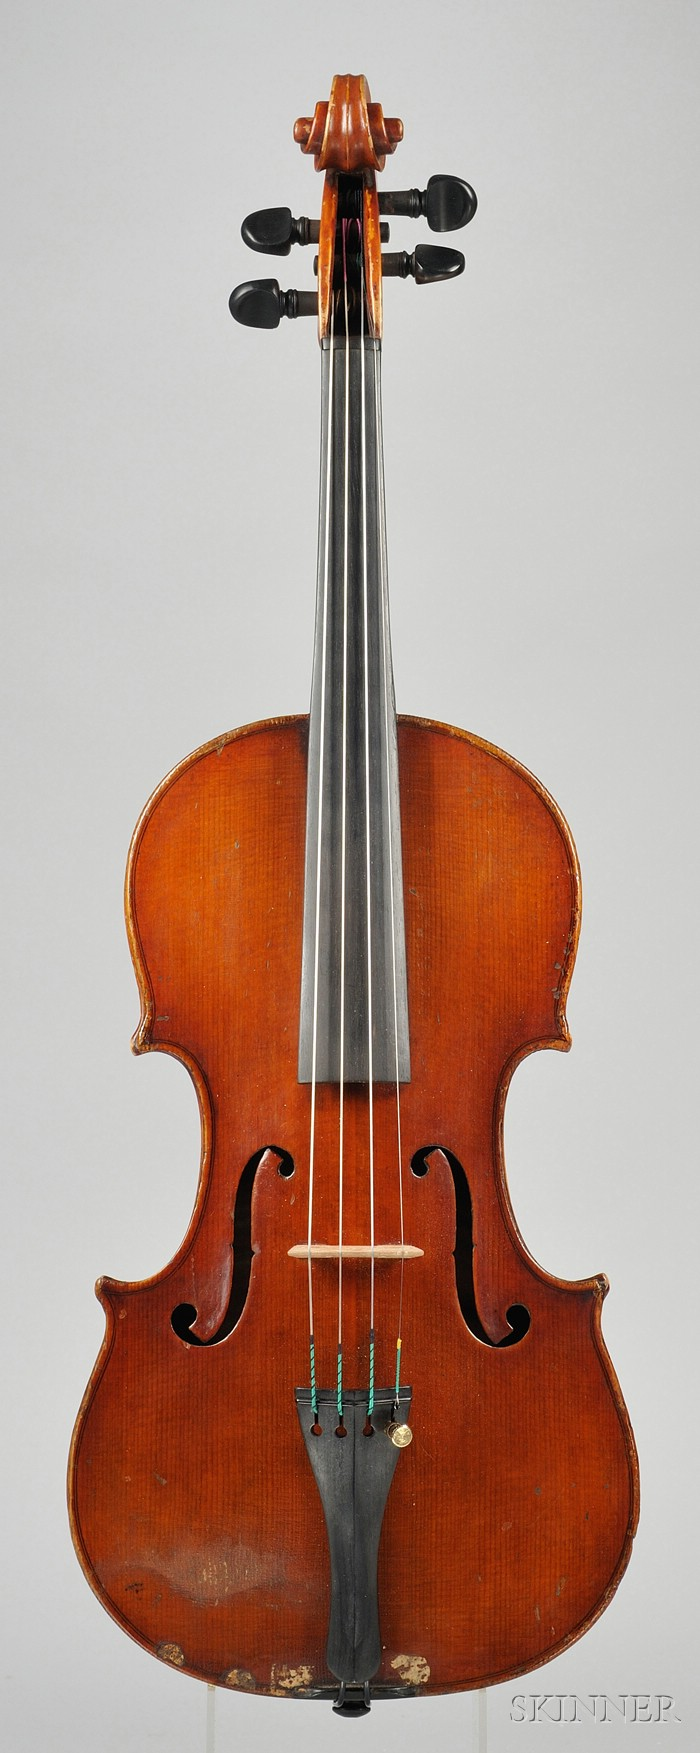 Italian Violin, Giulio Degani, Venice, c. 1930